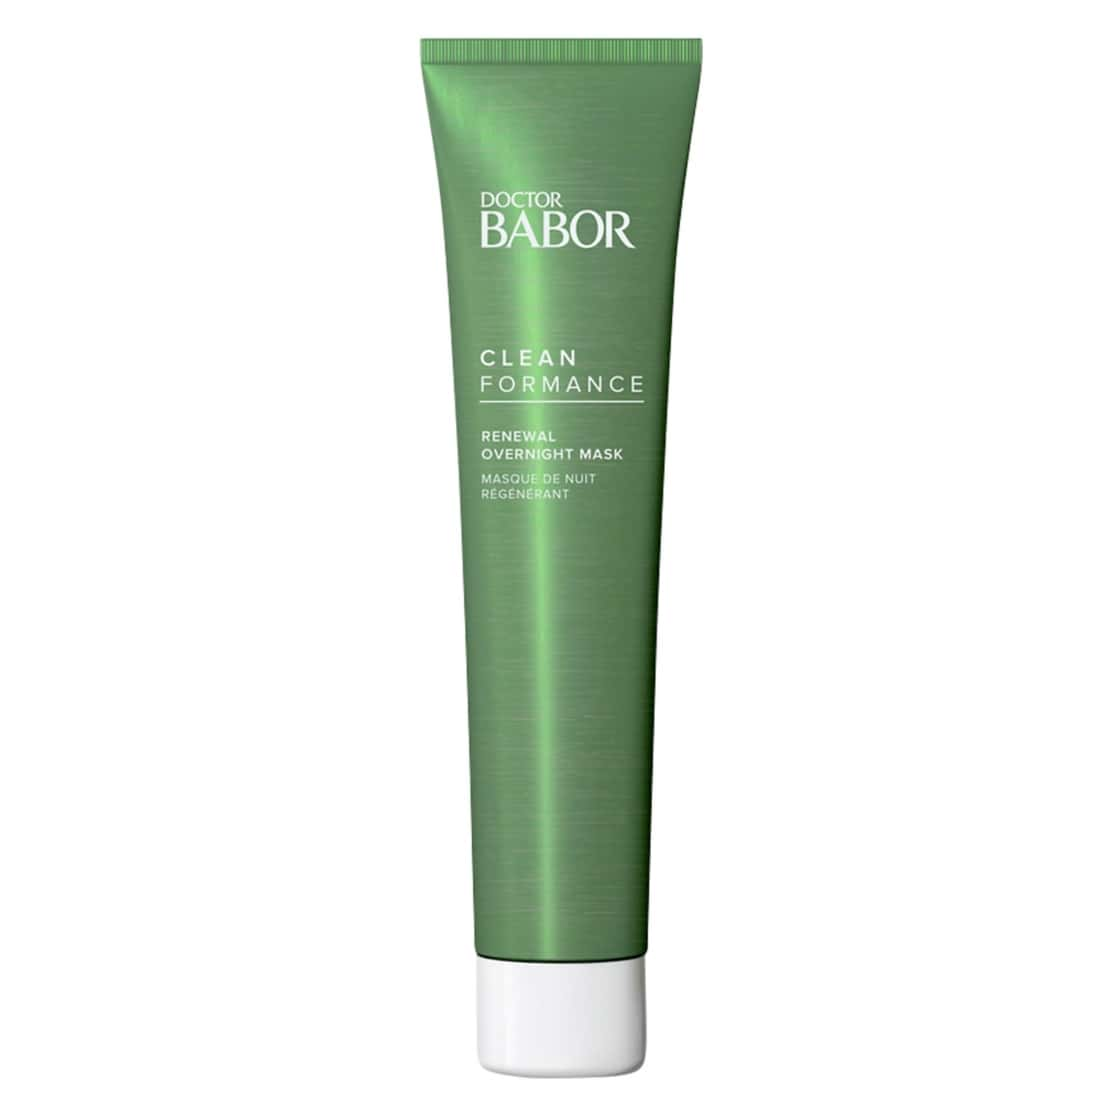 Doctor Babor Cleanformance Renewal Overnight Mask 75ml